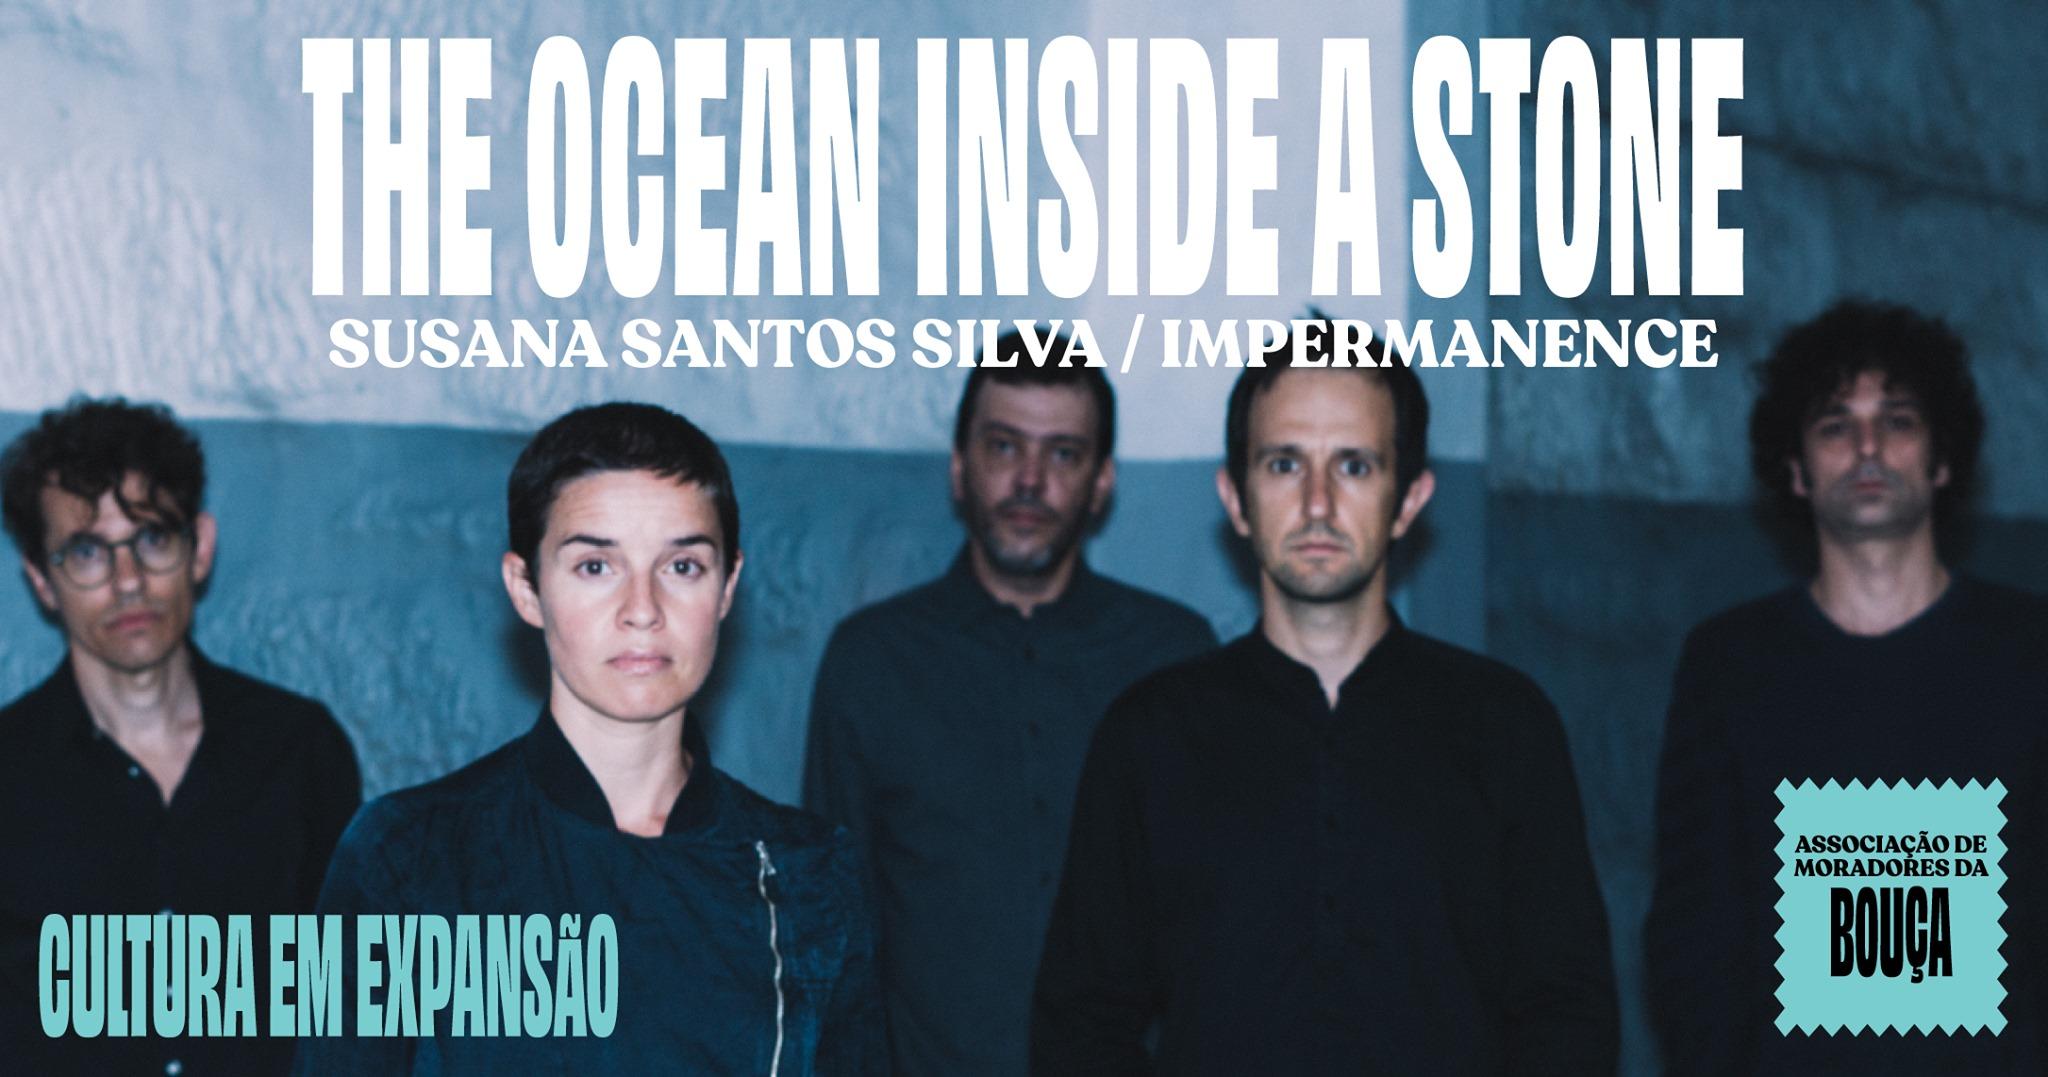 THE OCEAN INSIDE A STONE   SUSANA SANTOS SILVA / IMPERMANENCE